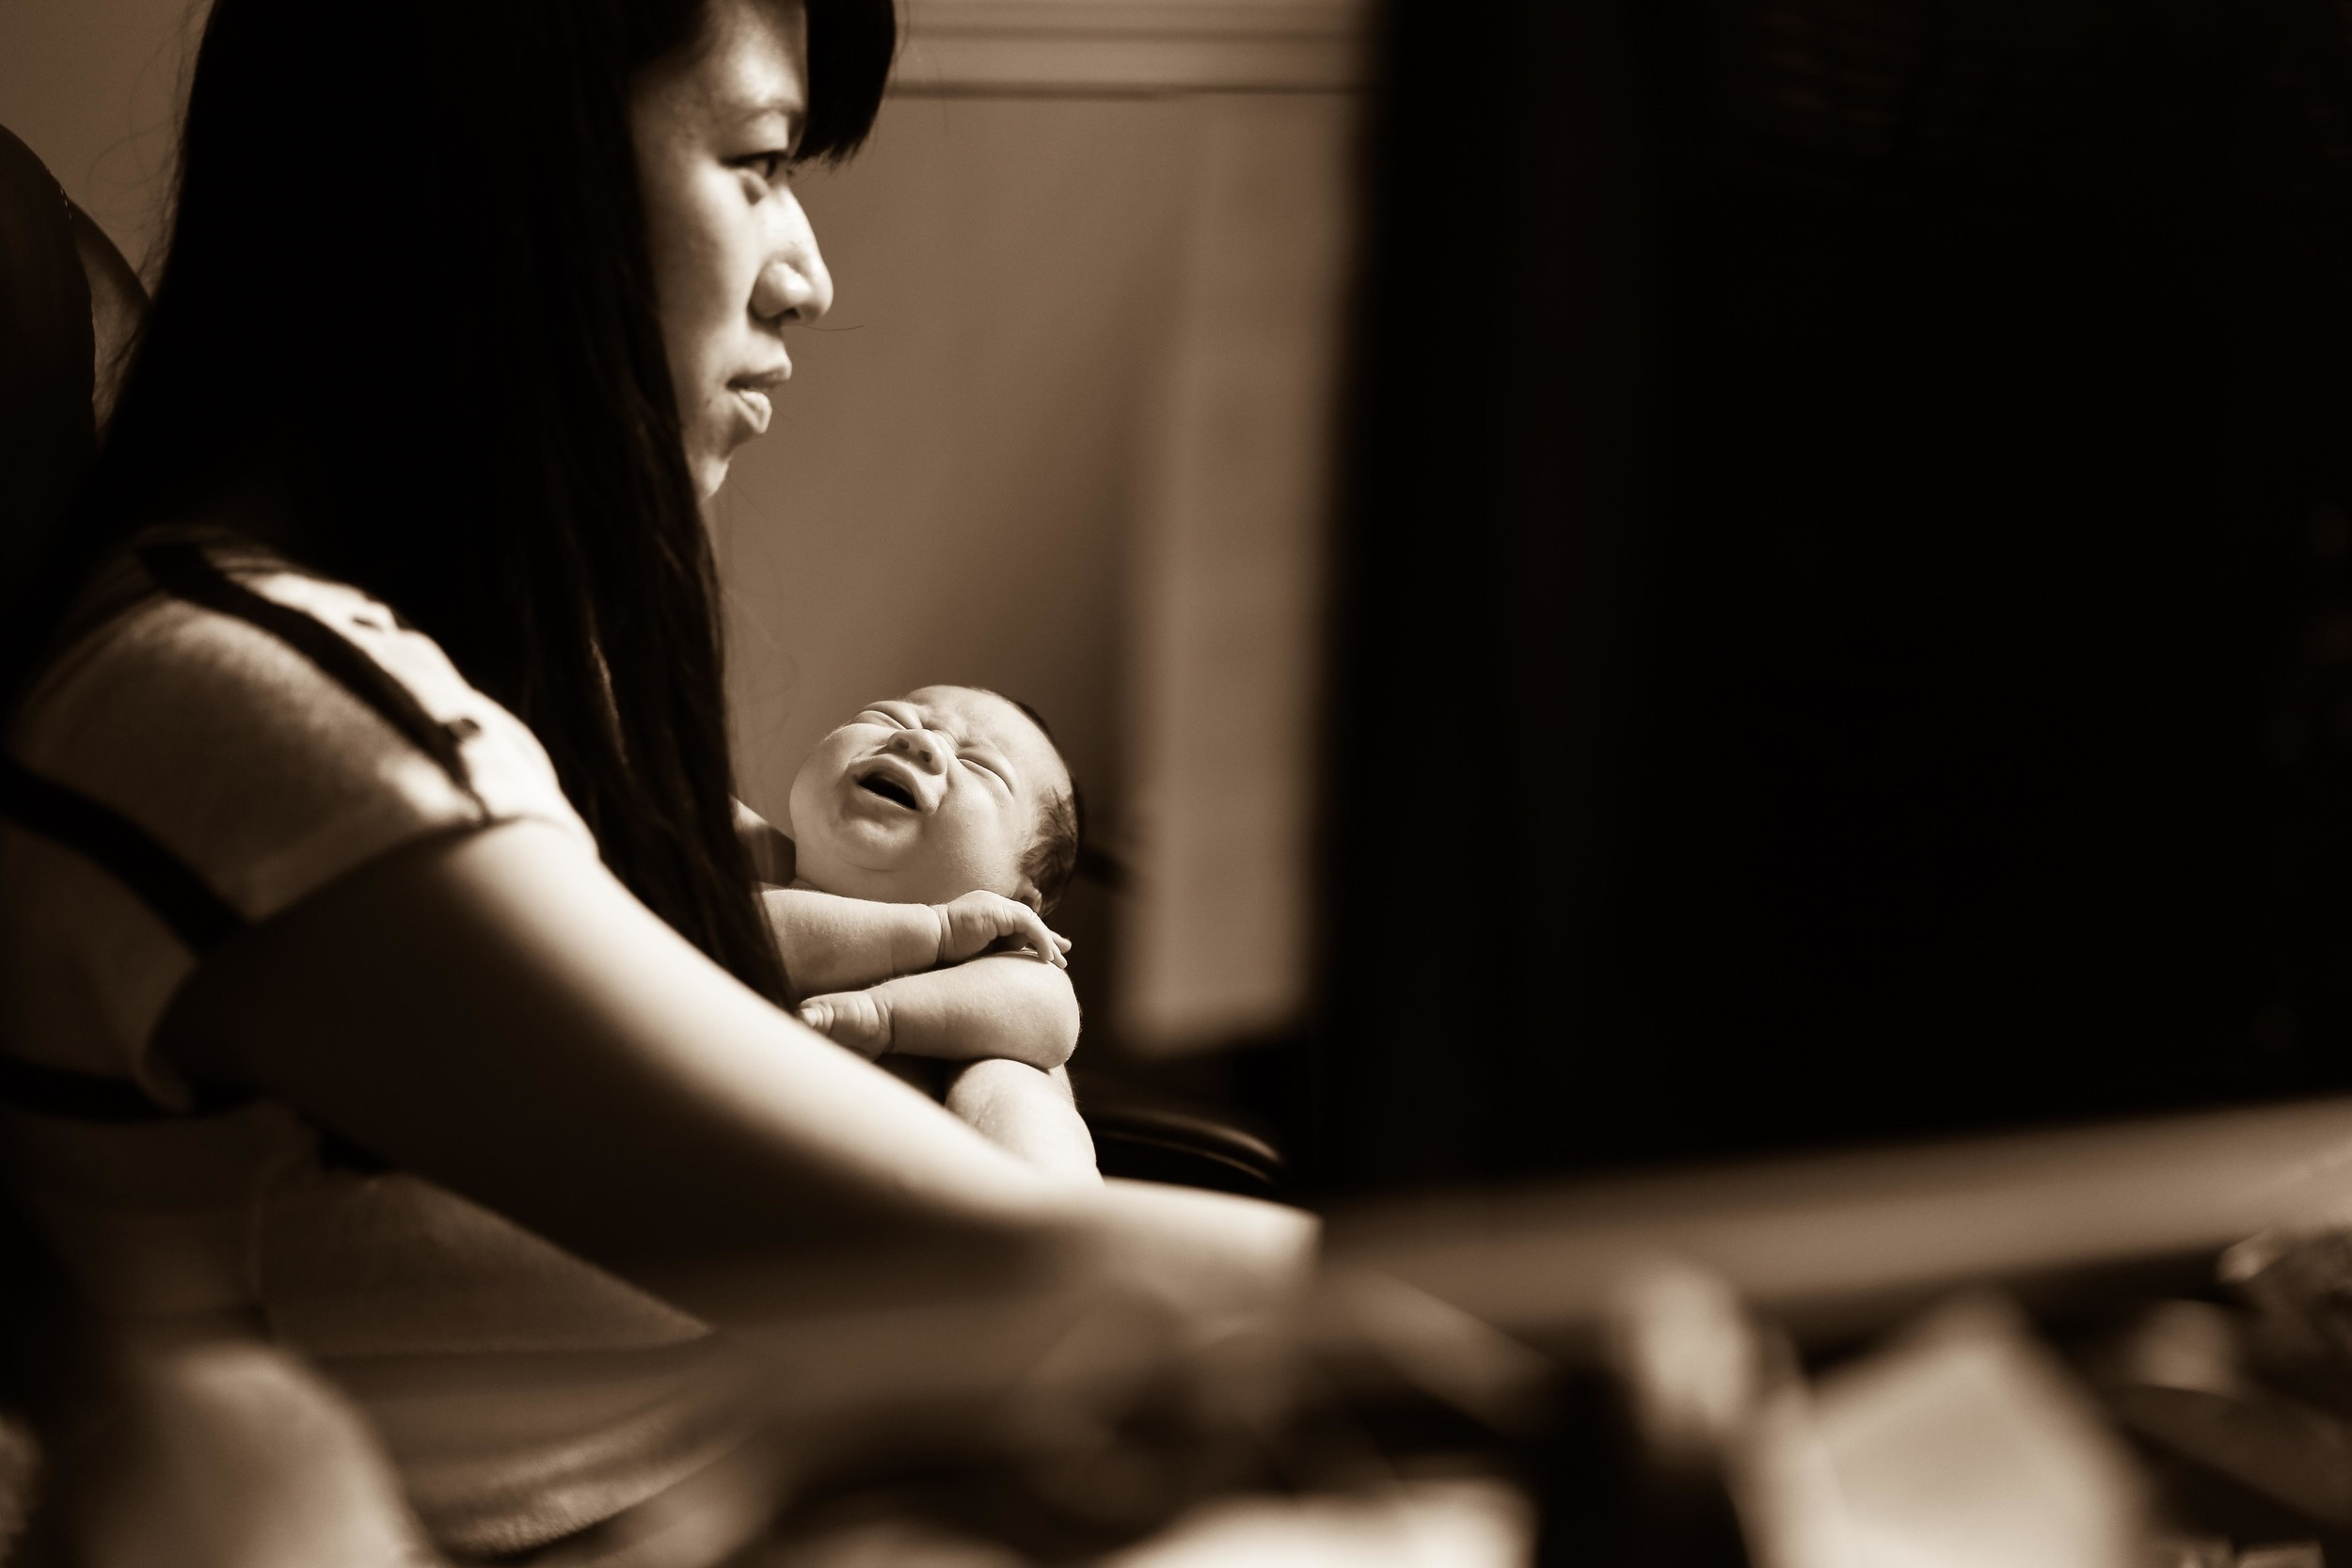 baby-blake-selected-photo-49.jpg